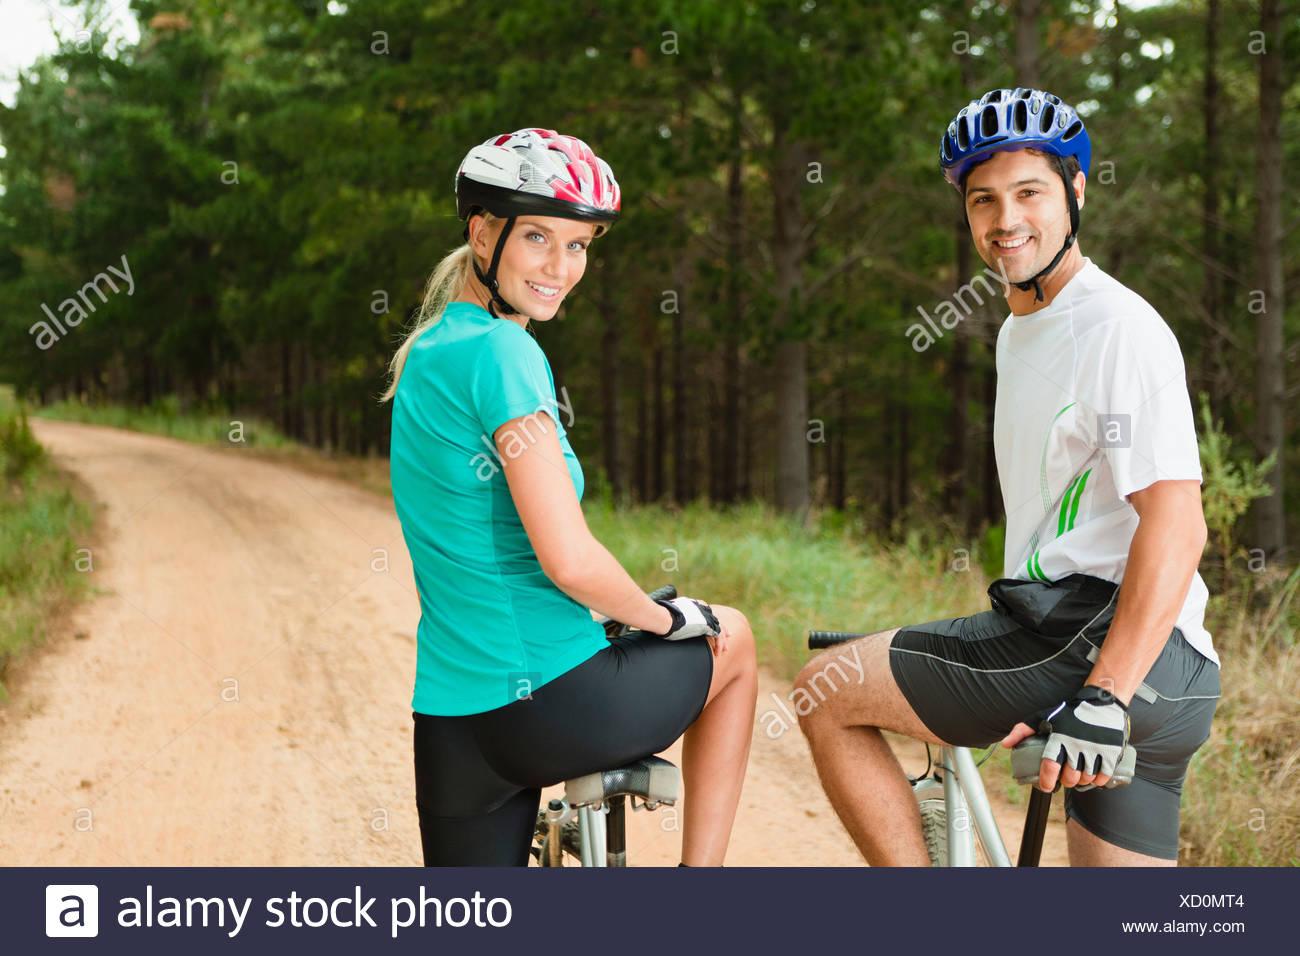 Couple mountain biking on dirt path - Stock Image